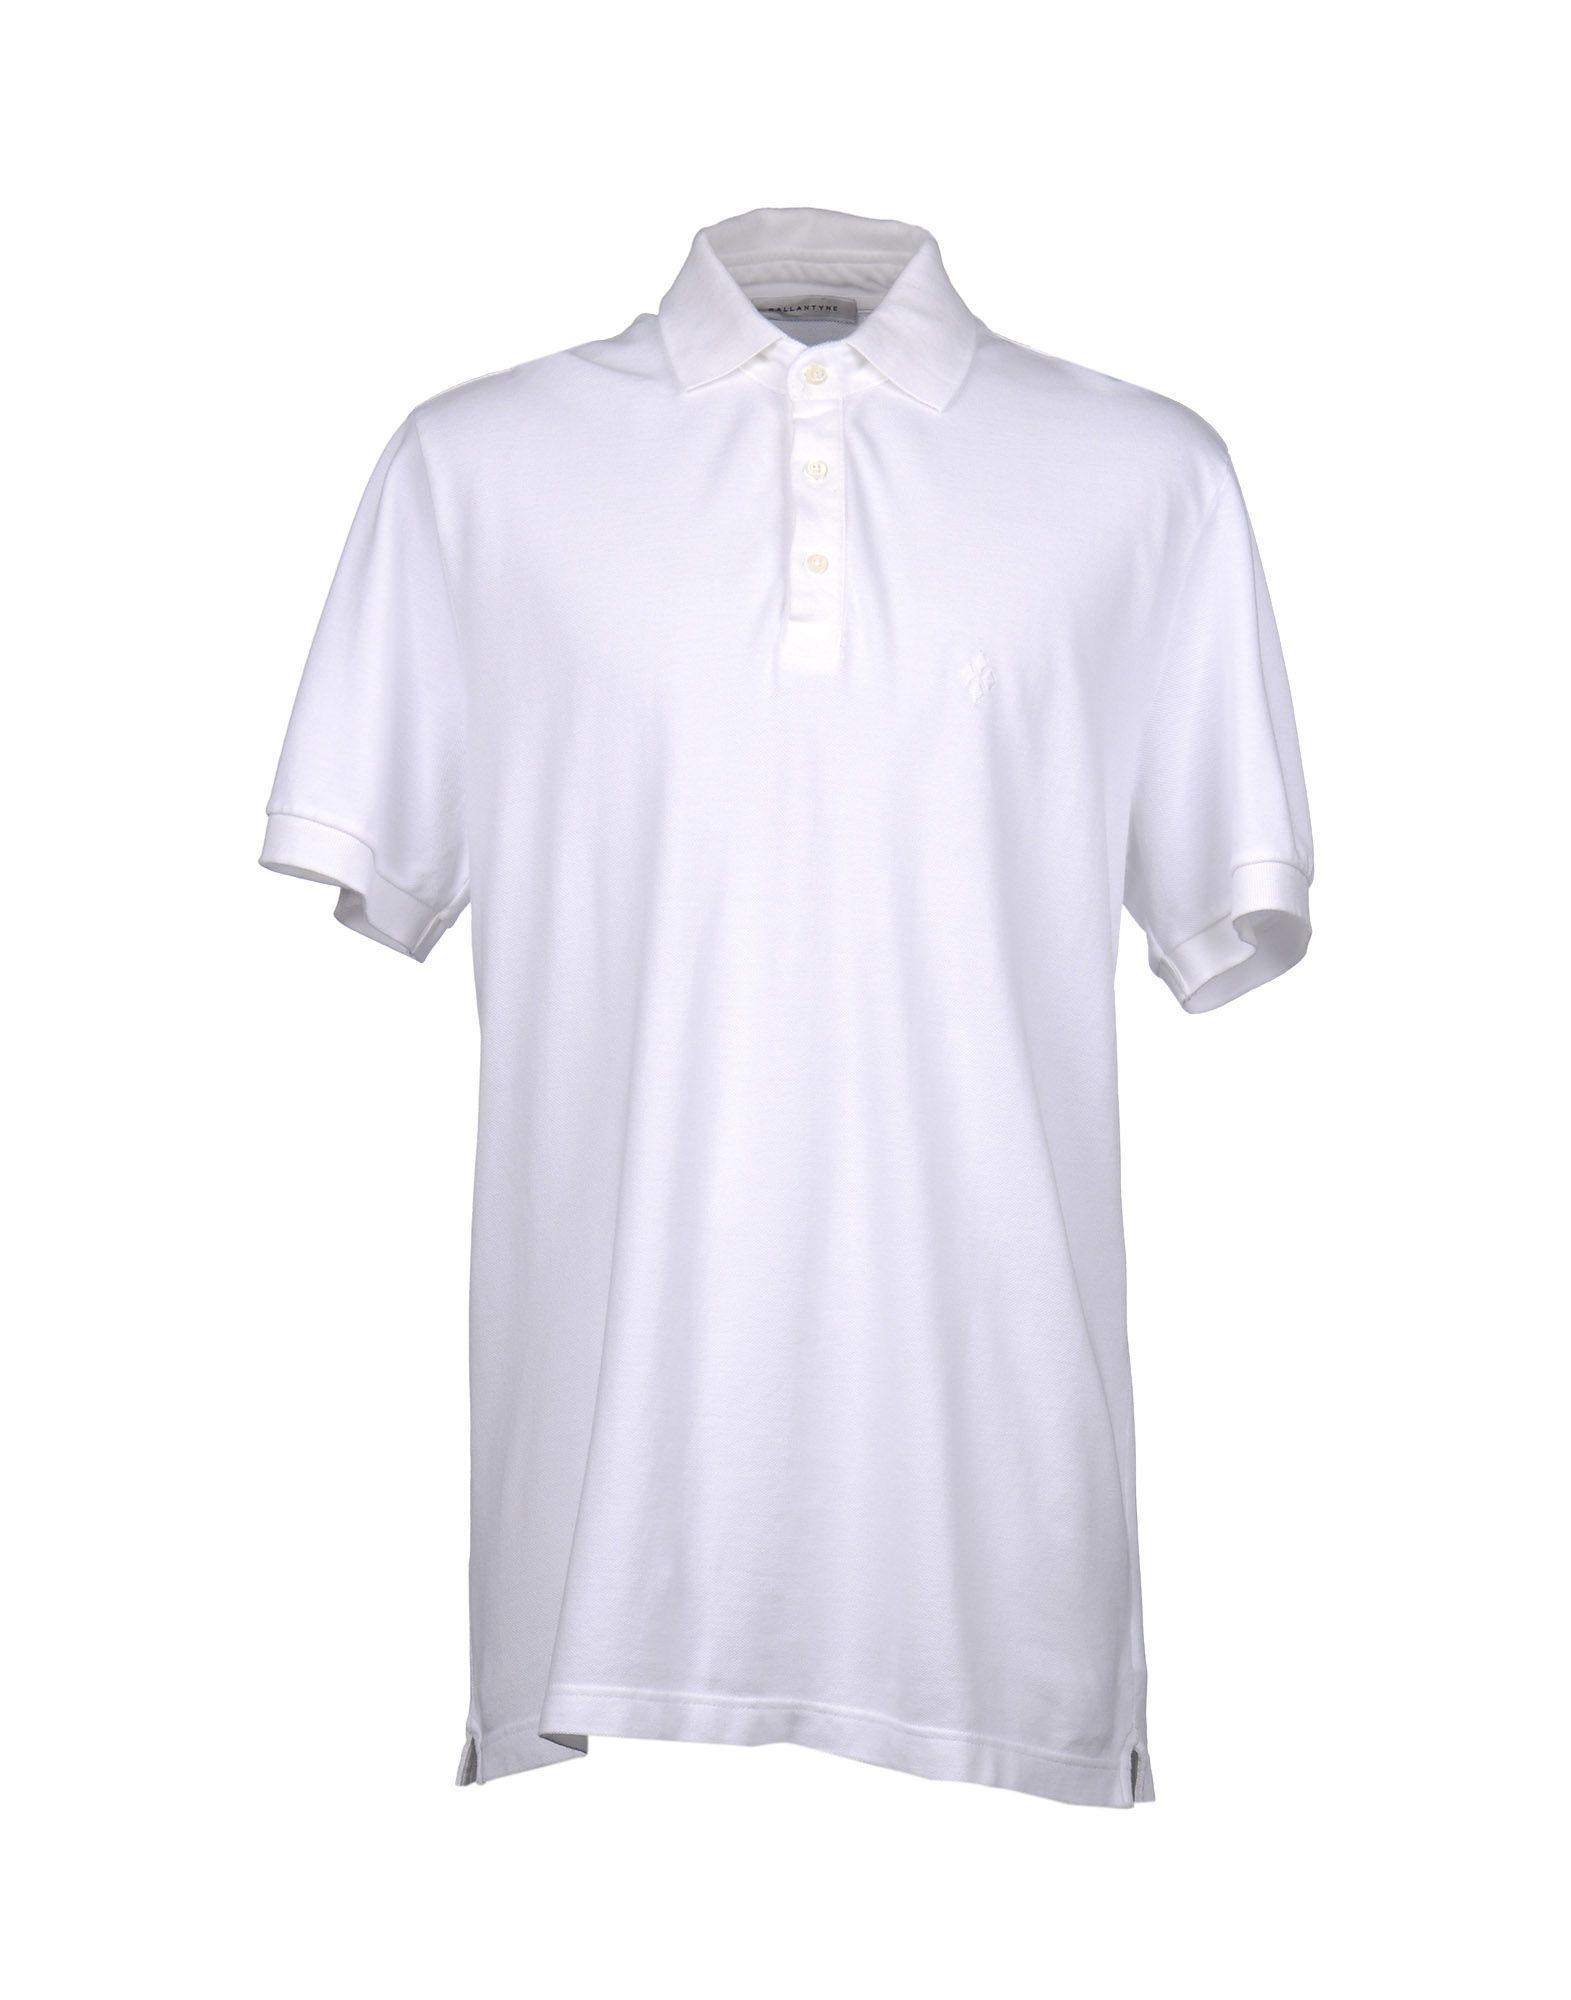 Ballantyne Polo Shirts In White